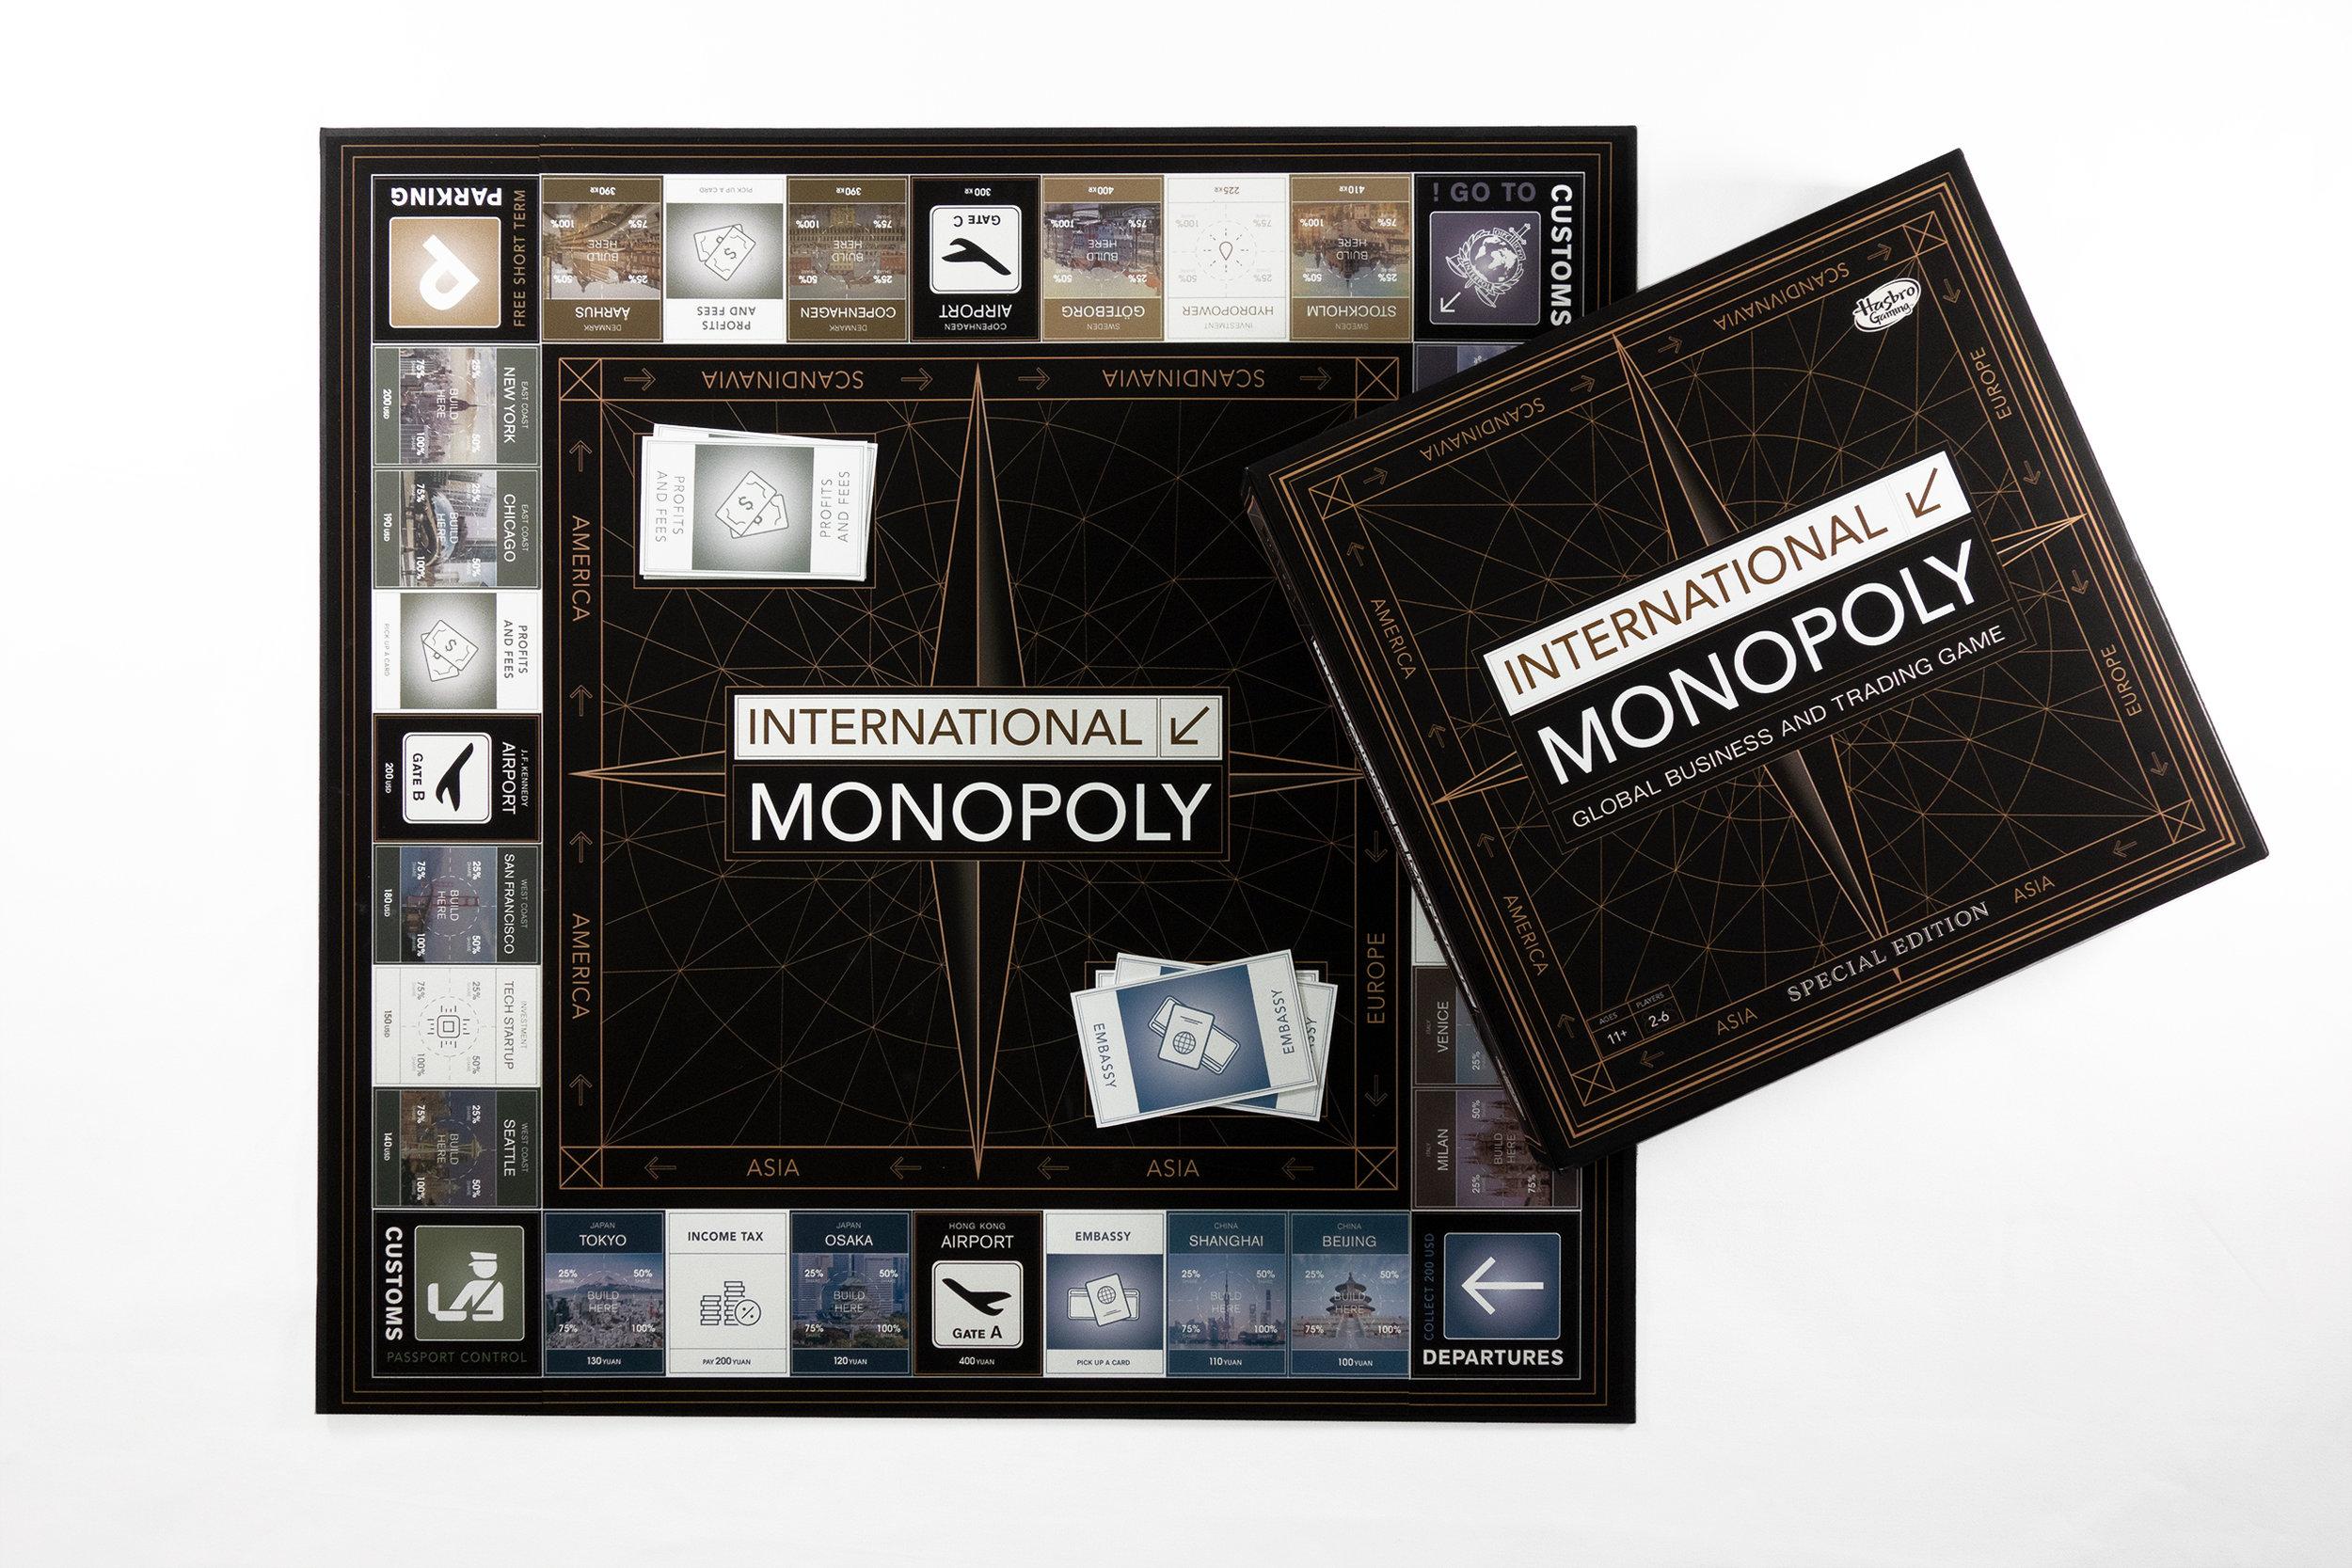 monopoly 3.jpg